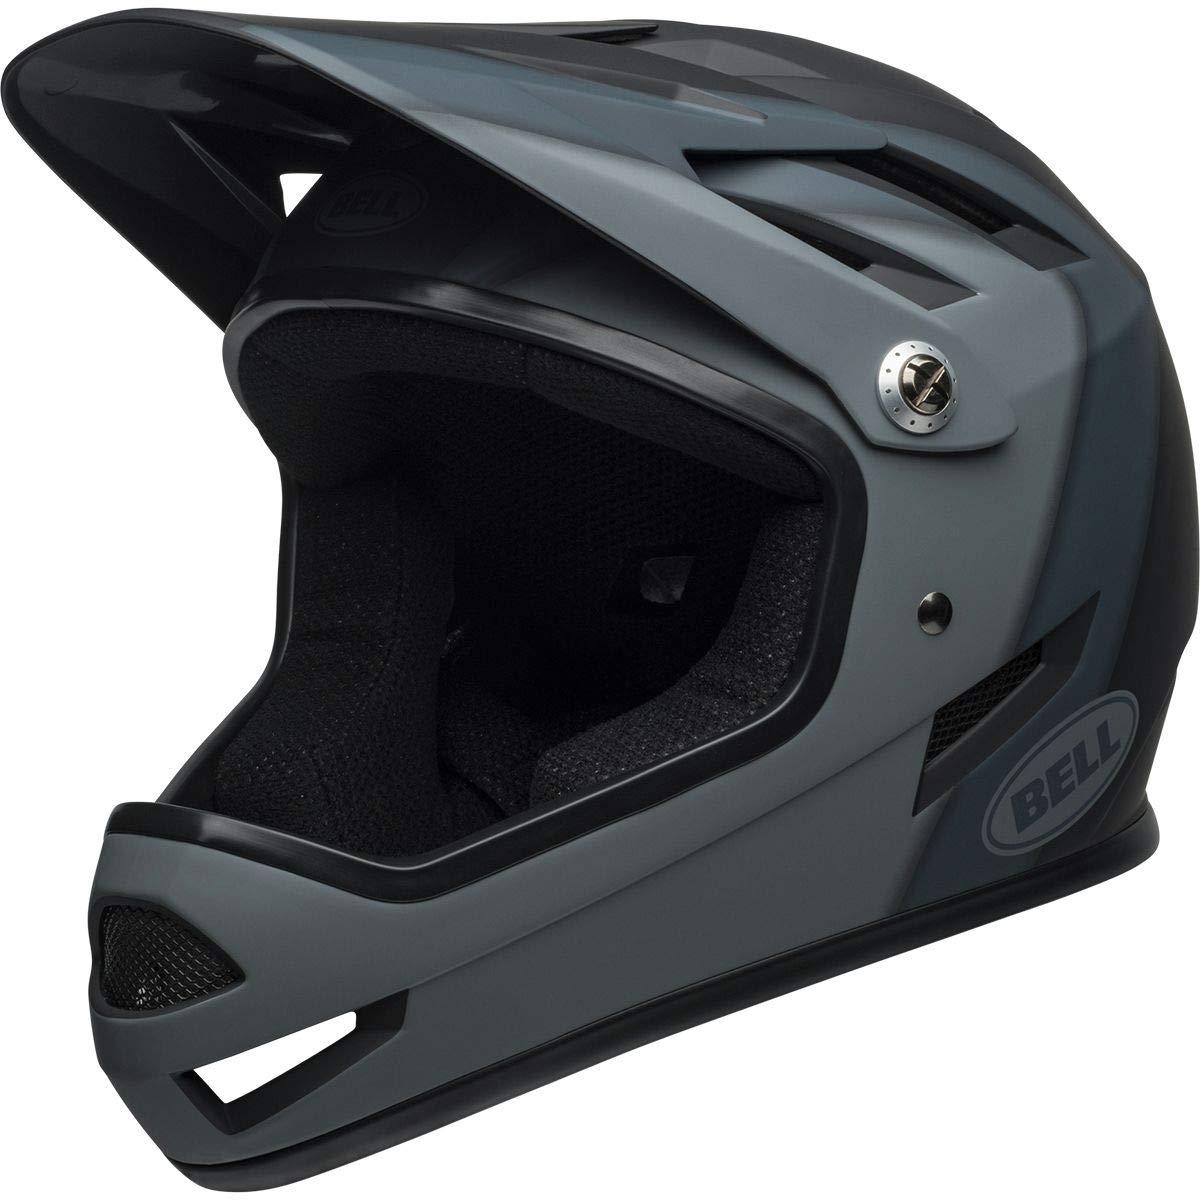 Bell Sanction Bike Helmet - Presences Matte Black Small